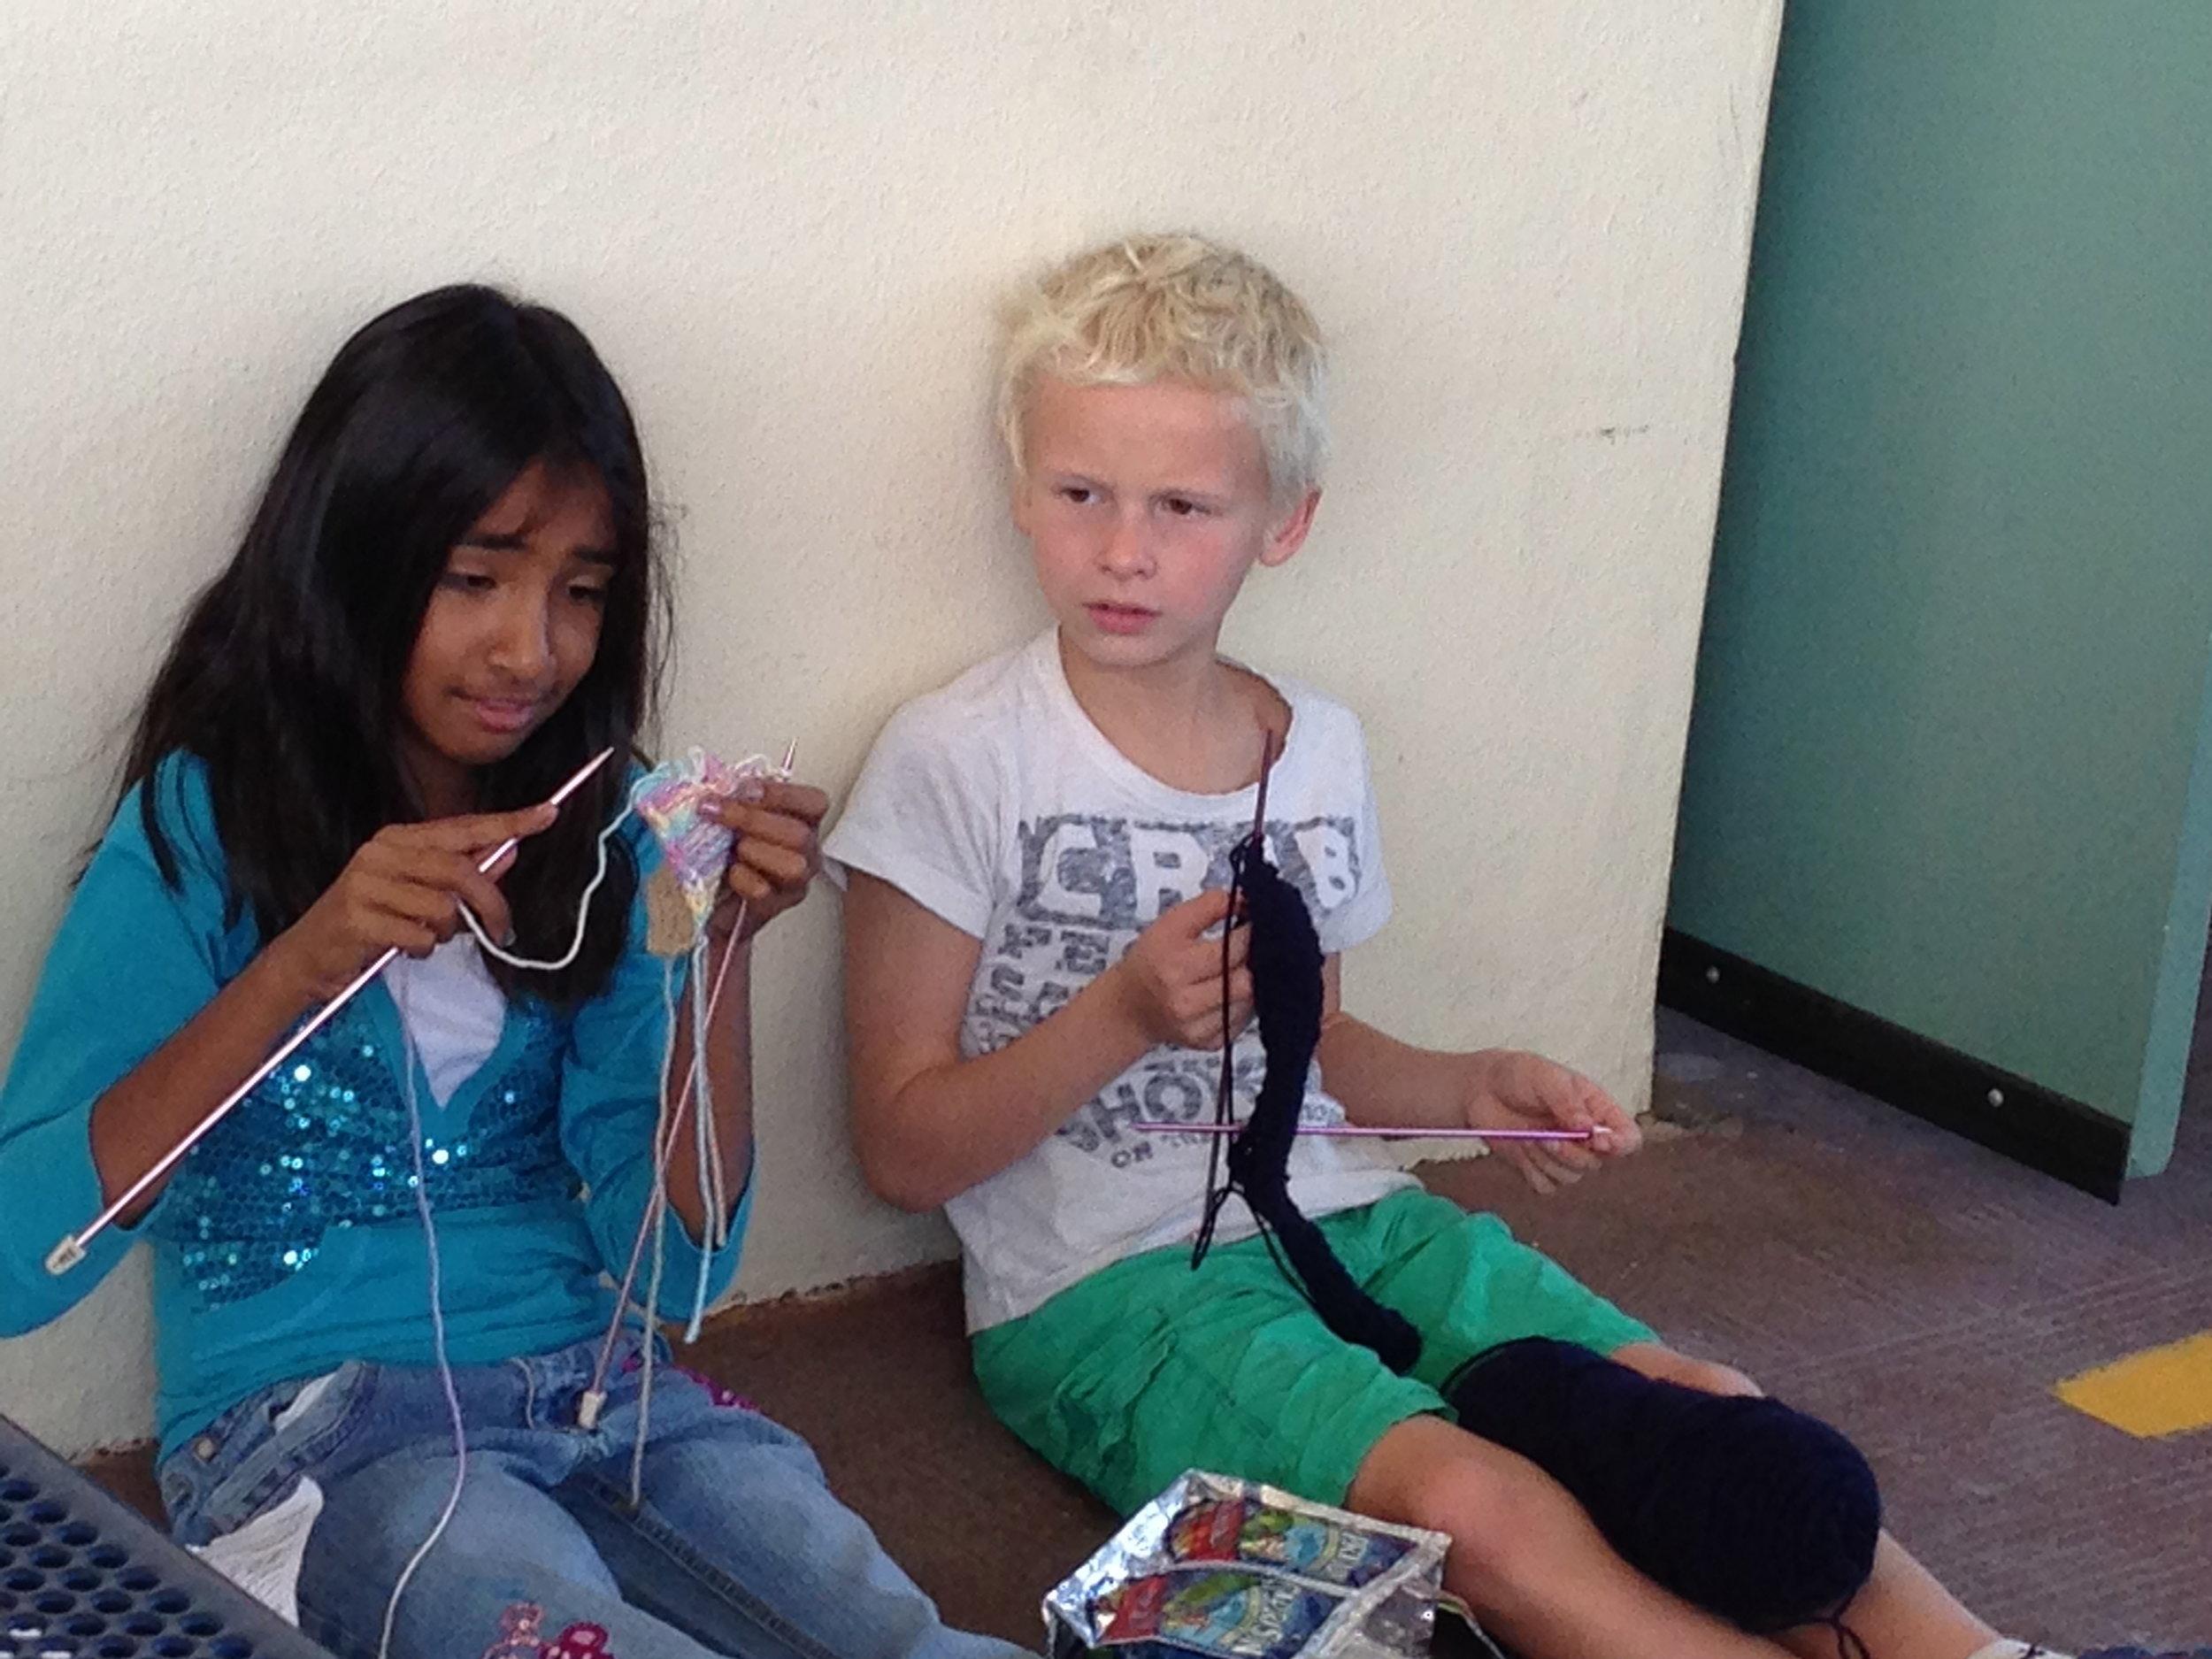 3rd graders chattin' and knittin'.